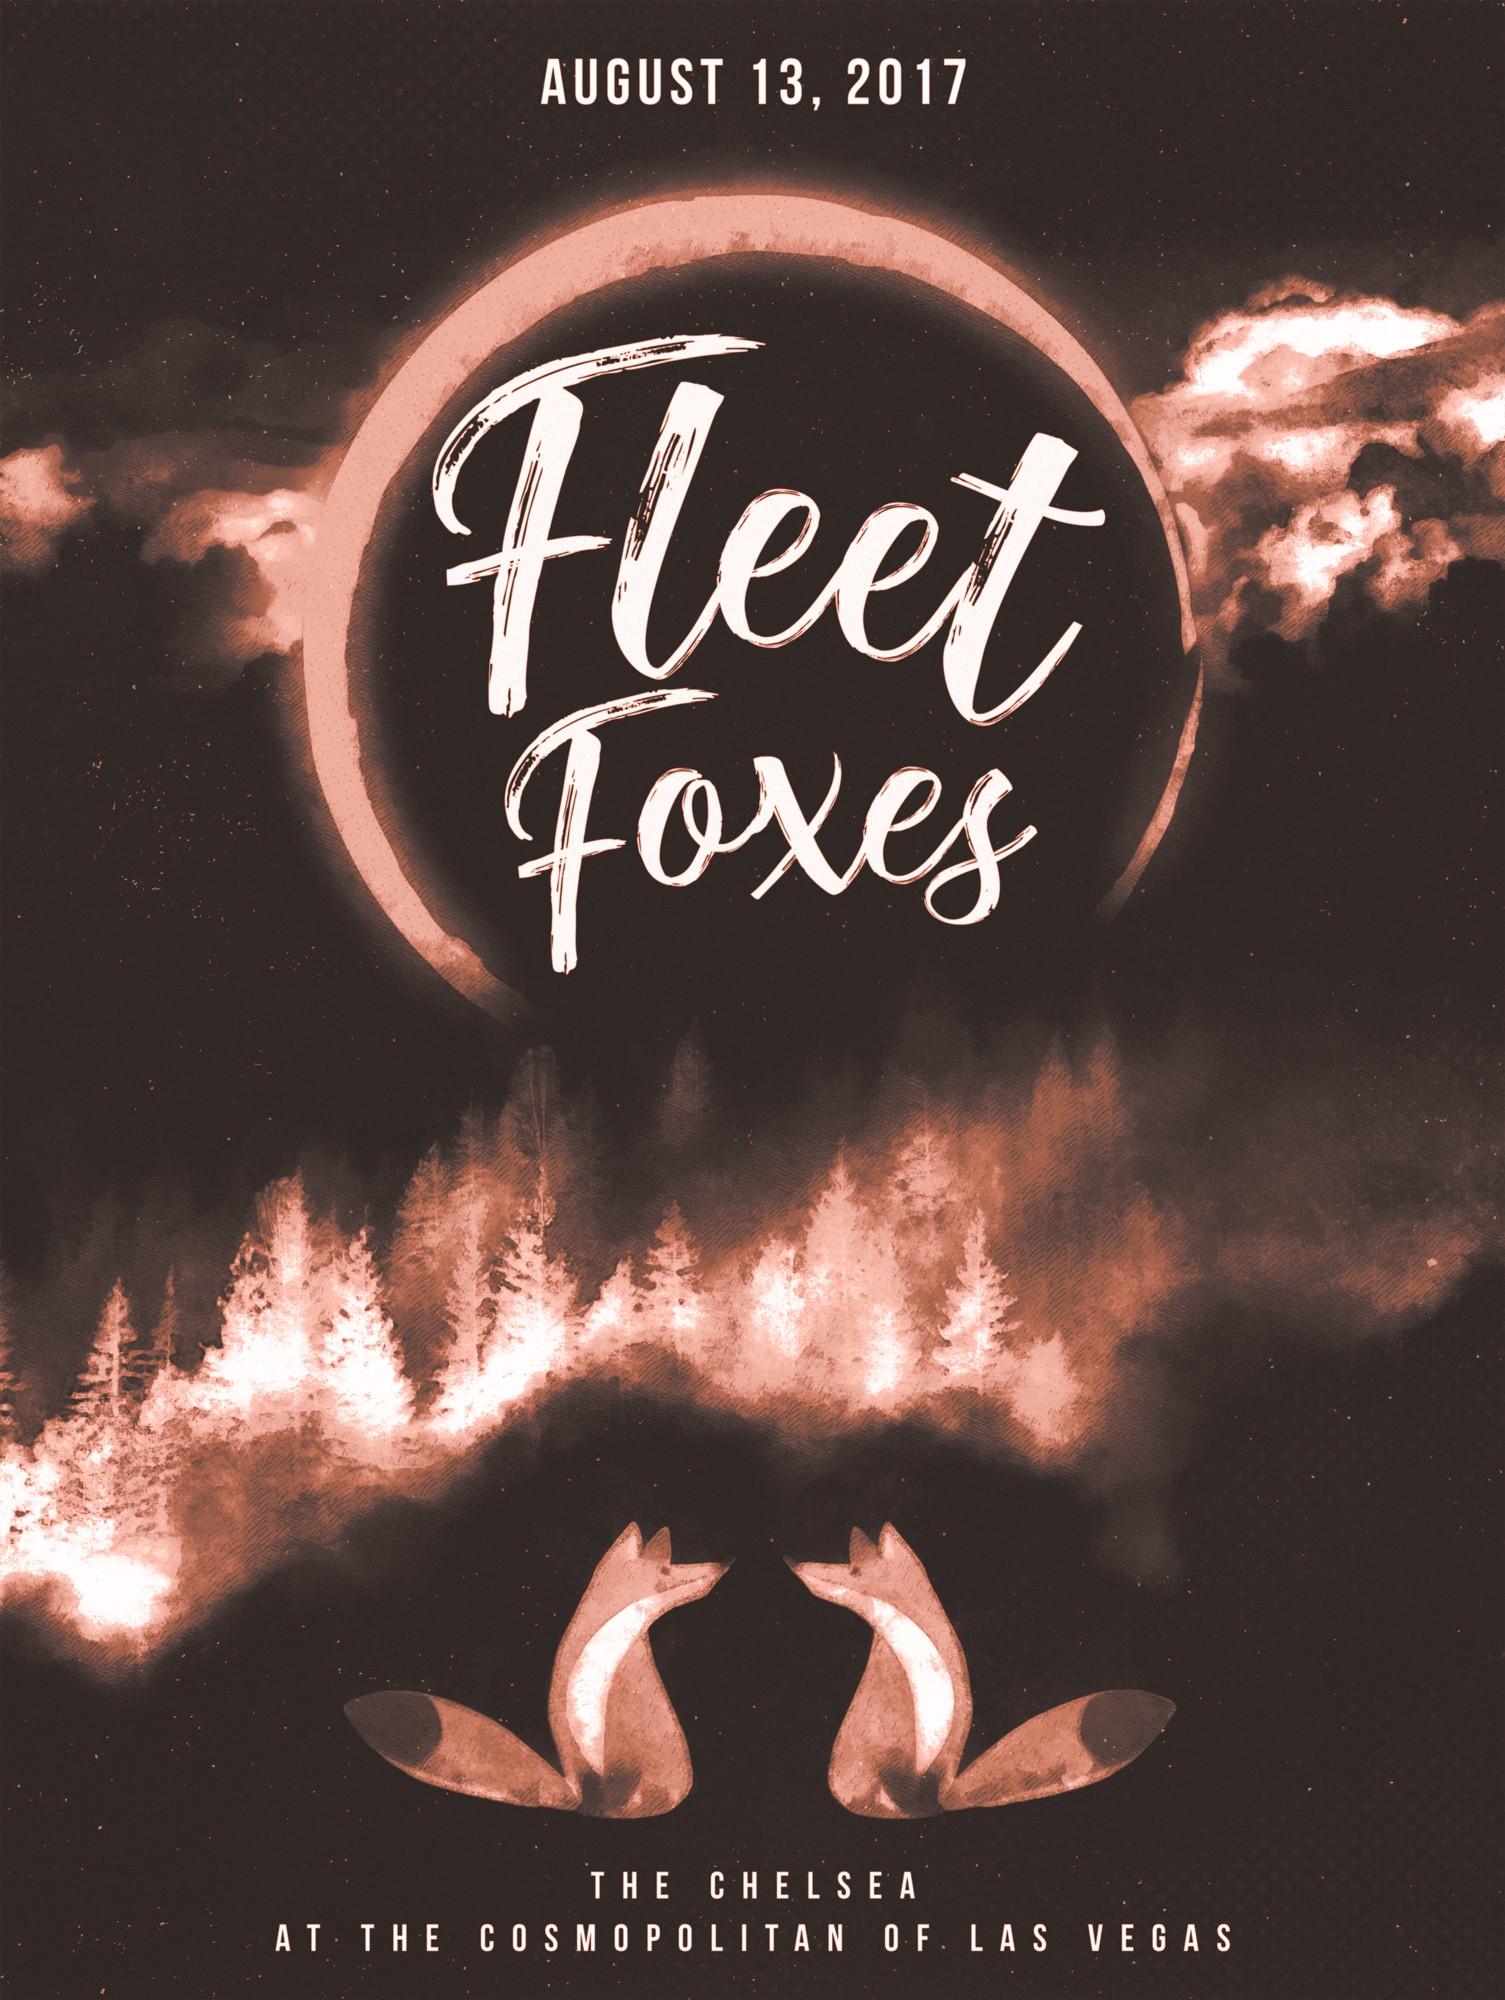 Design Concert Posters for Screen Print - Fleet Foxes @ The Cosmopolitan of Las Vegas